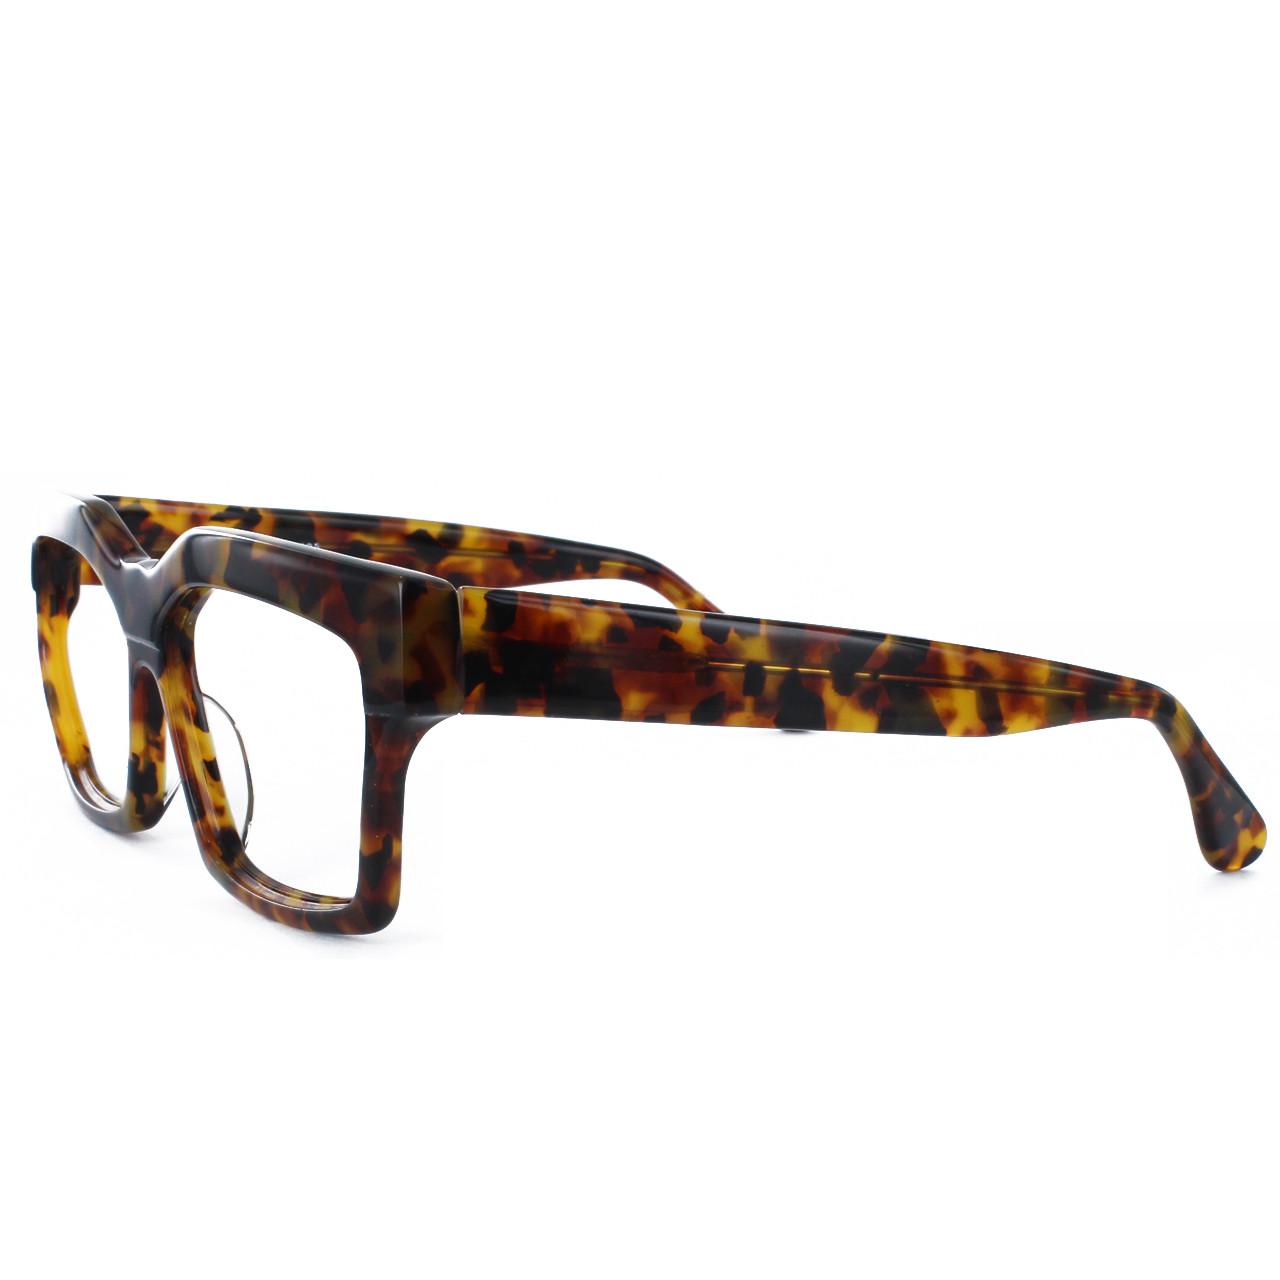 GEEK Eyewear GEEK 705